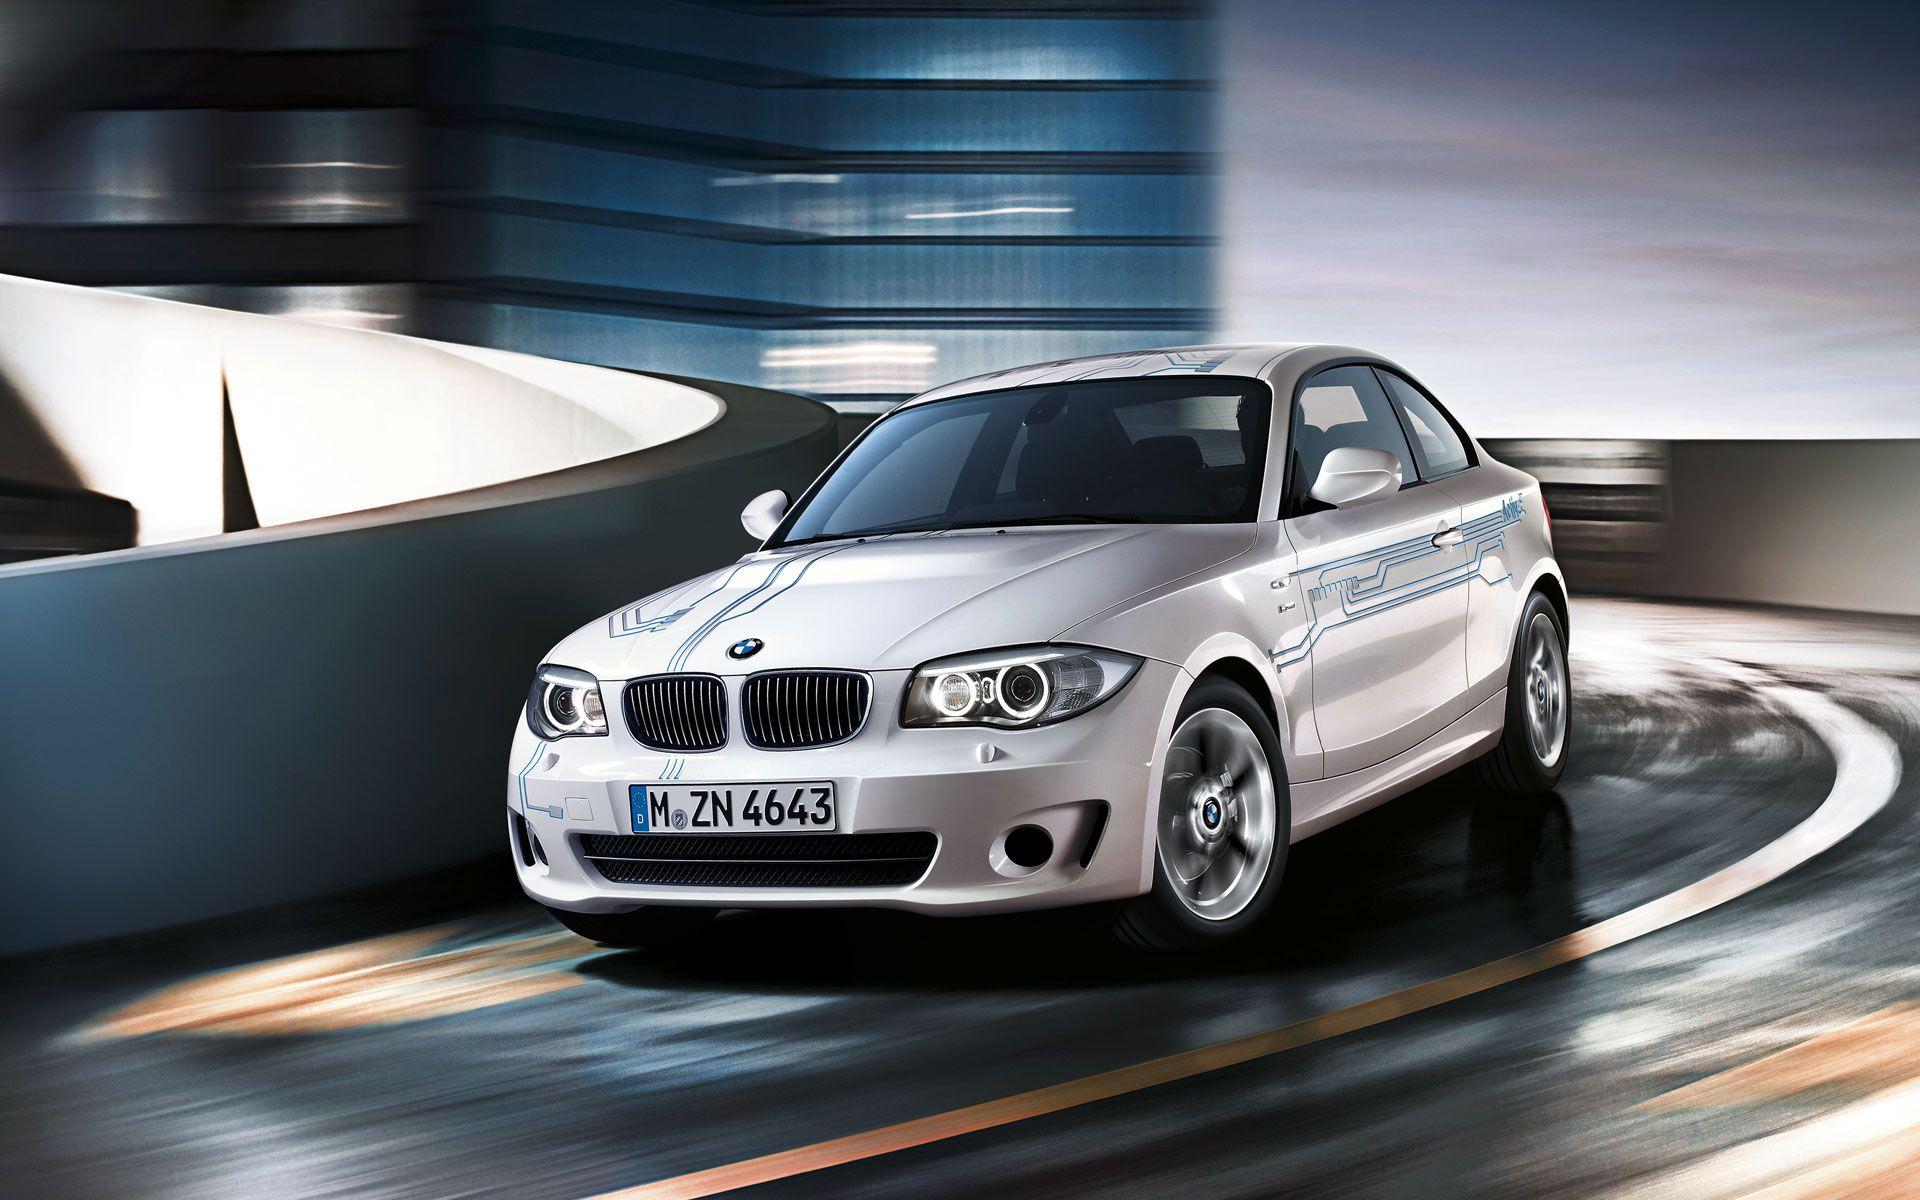 100% electric + 100% BMW = Awesome.